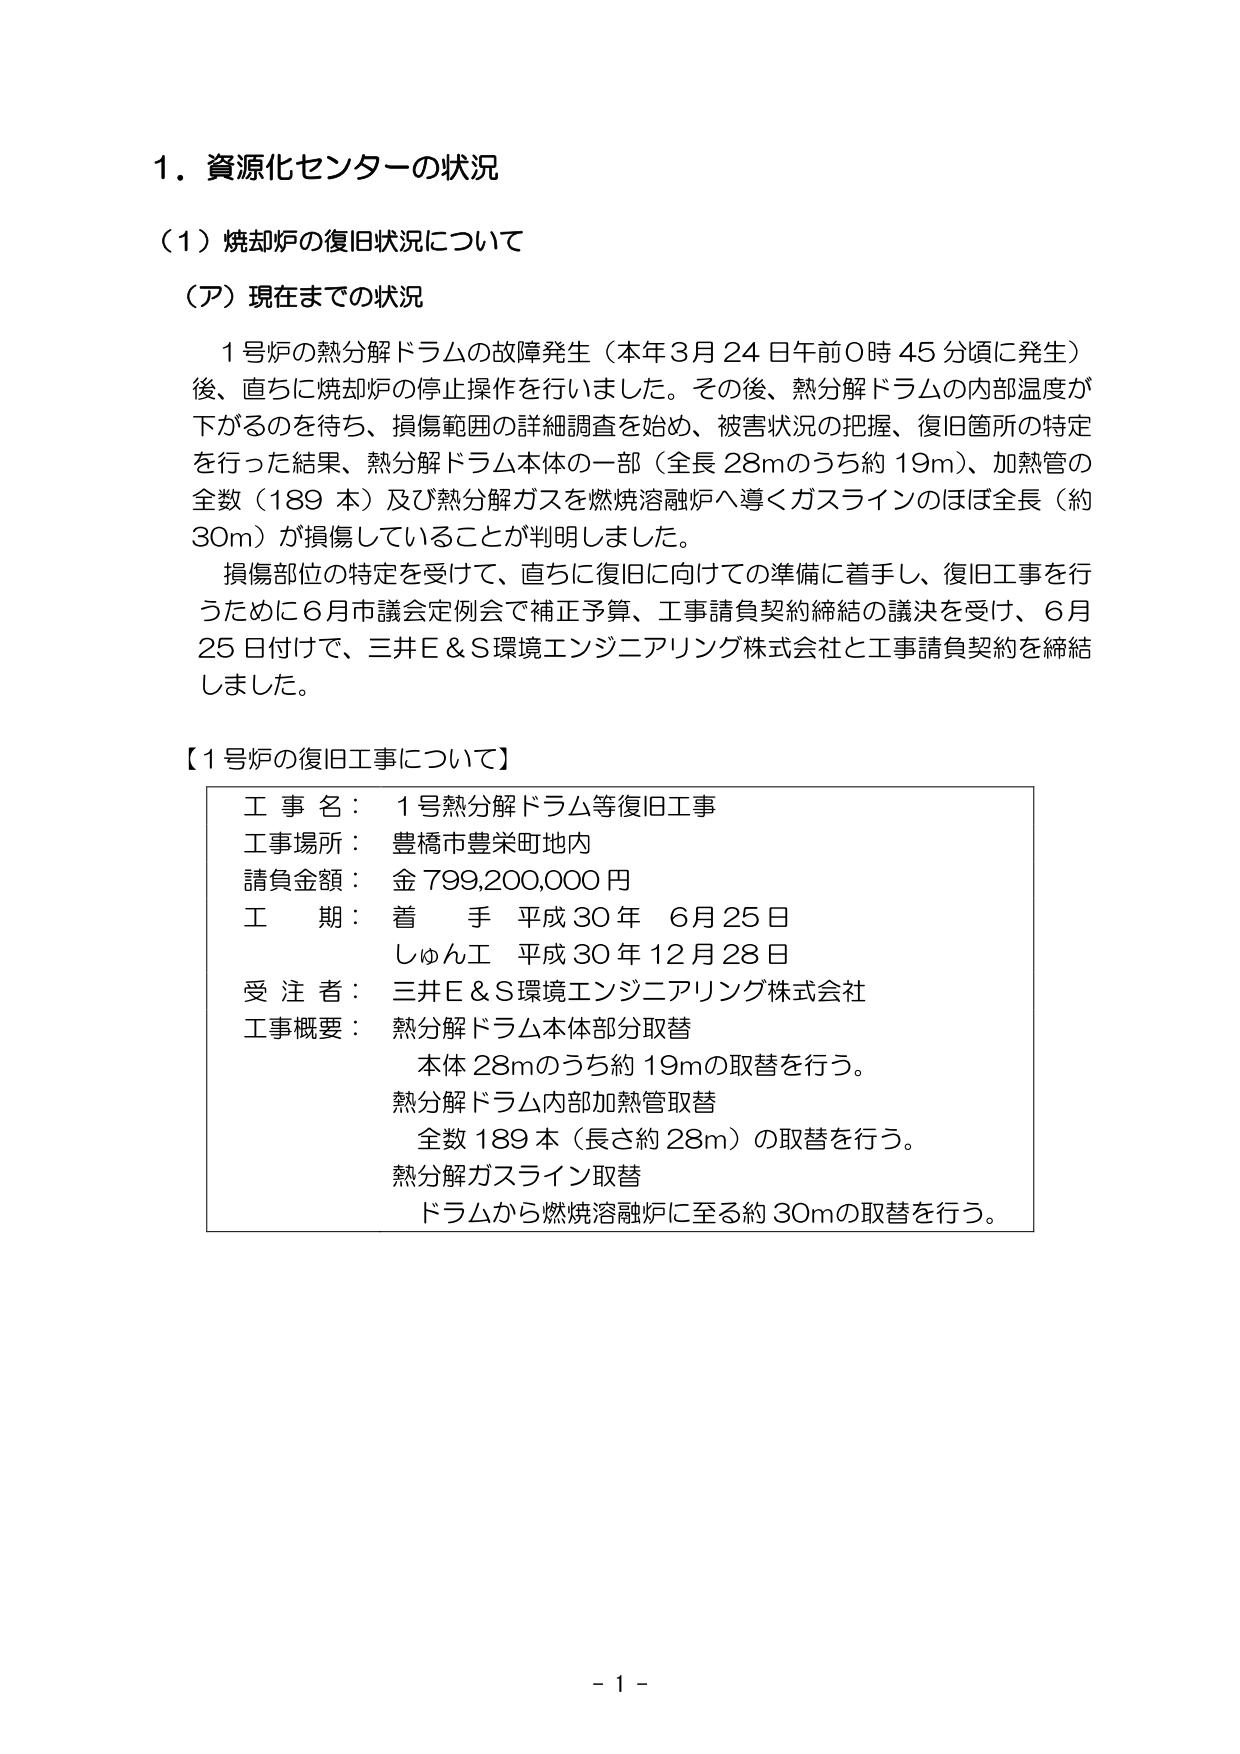 181113_181005kankyokeizai_04